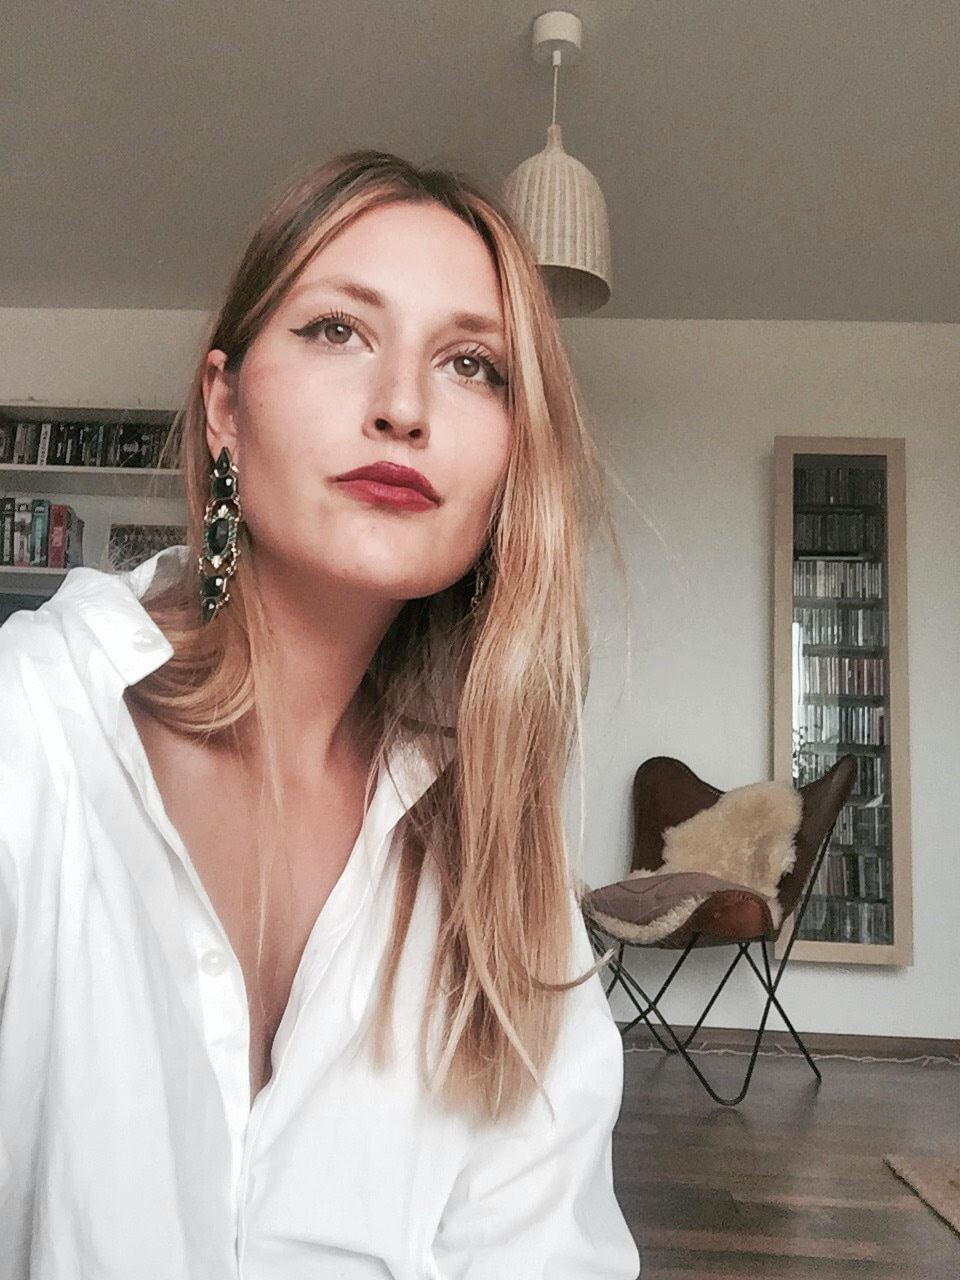 Go to Lena Malevitis's profile